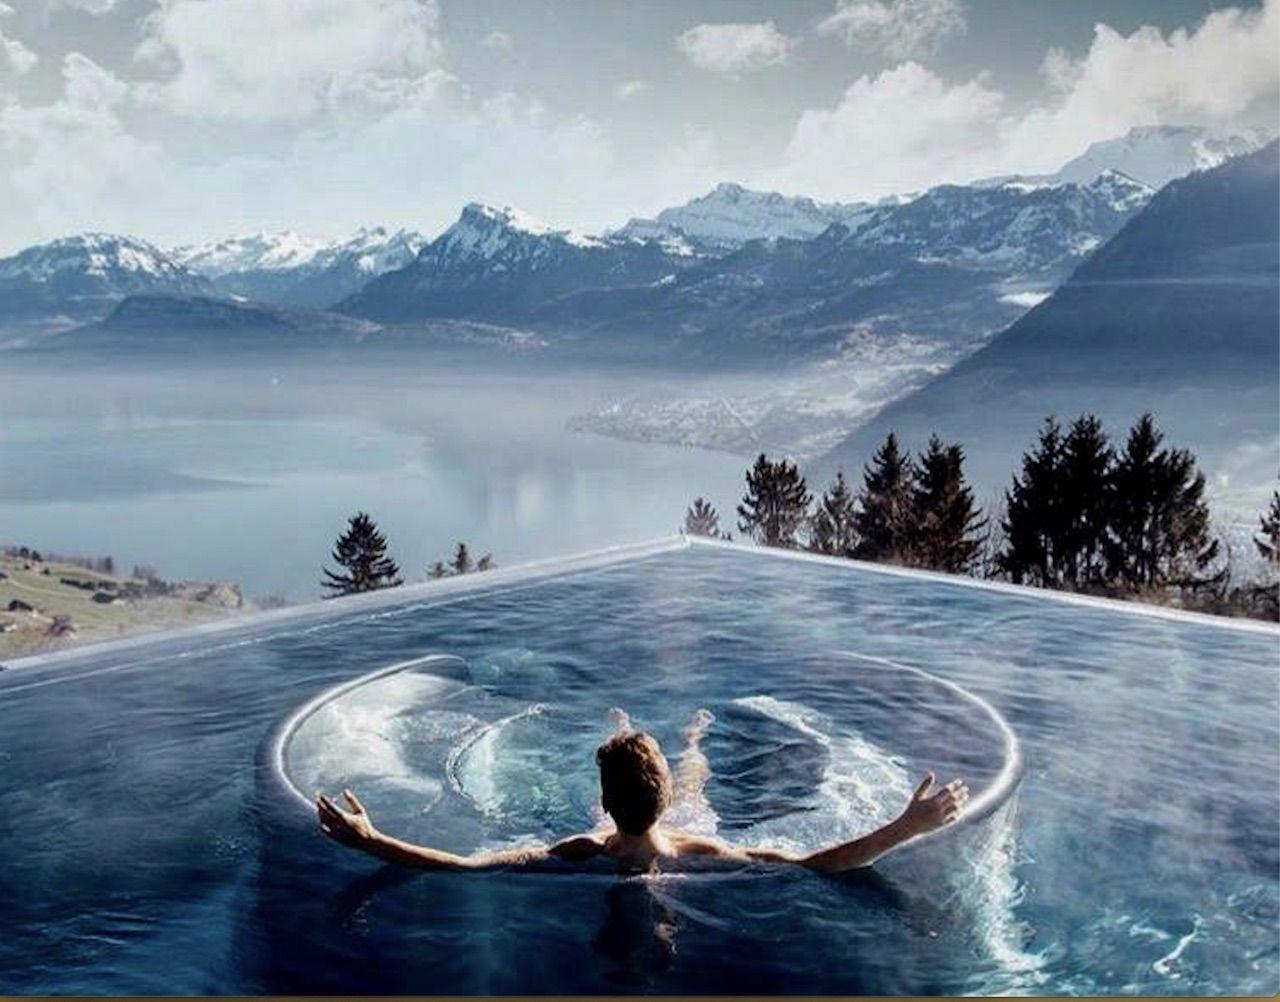 Hotel Villa Honegg – Ennetbürgen, Switzerland